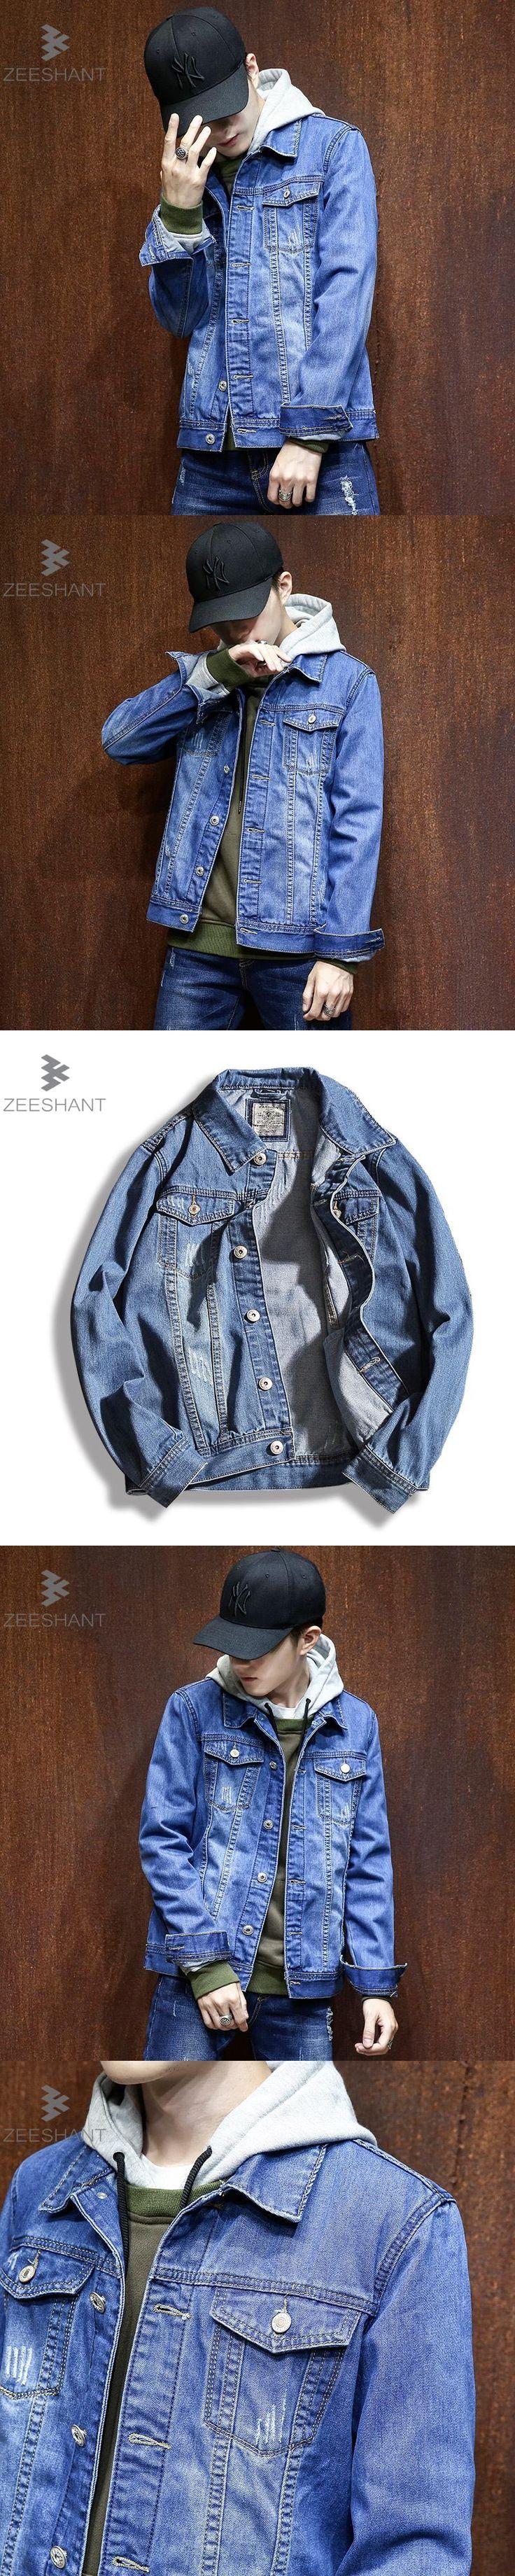 ZEESHANT Solid Casual Slim Mens Denim Jacket Plus Size M-4XL 5XL Bomber Jacket Men Cowboy Men's Jean Jacket Chaqueta Hombre